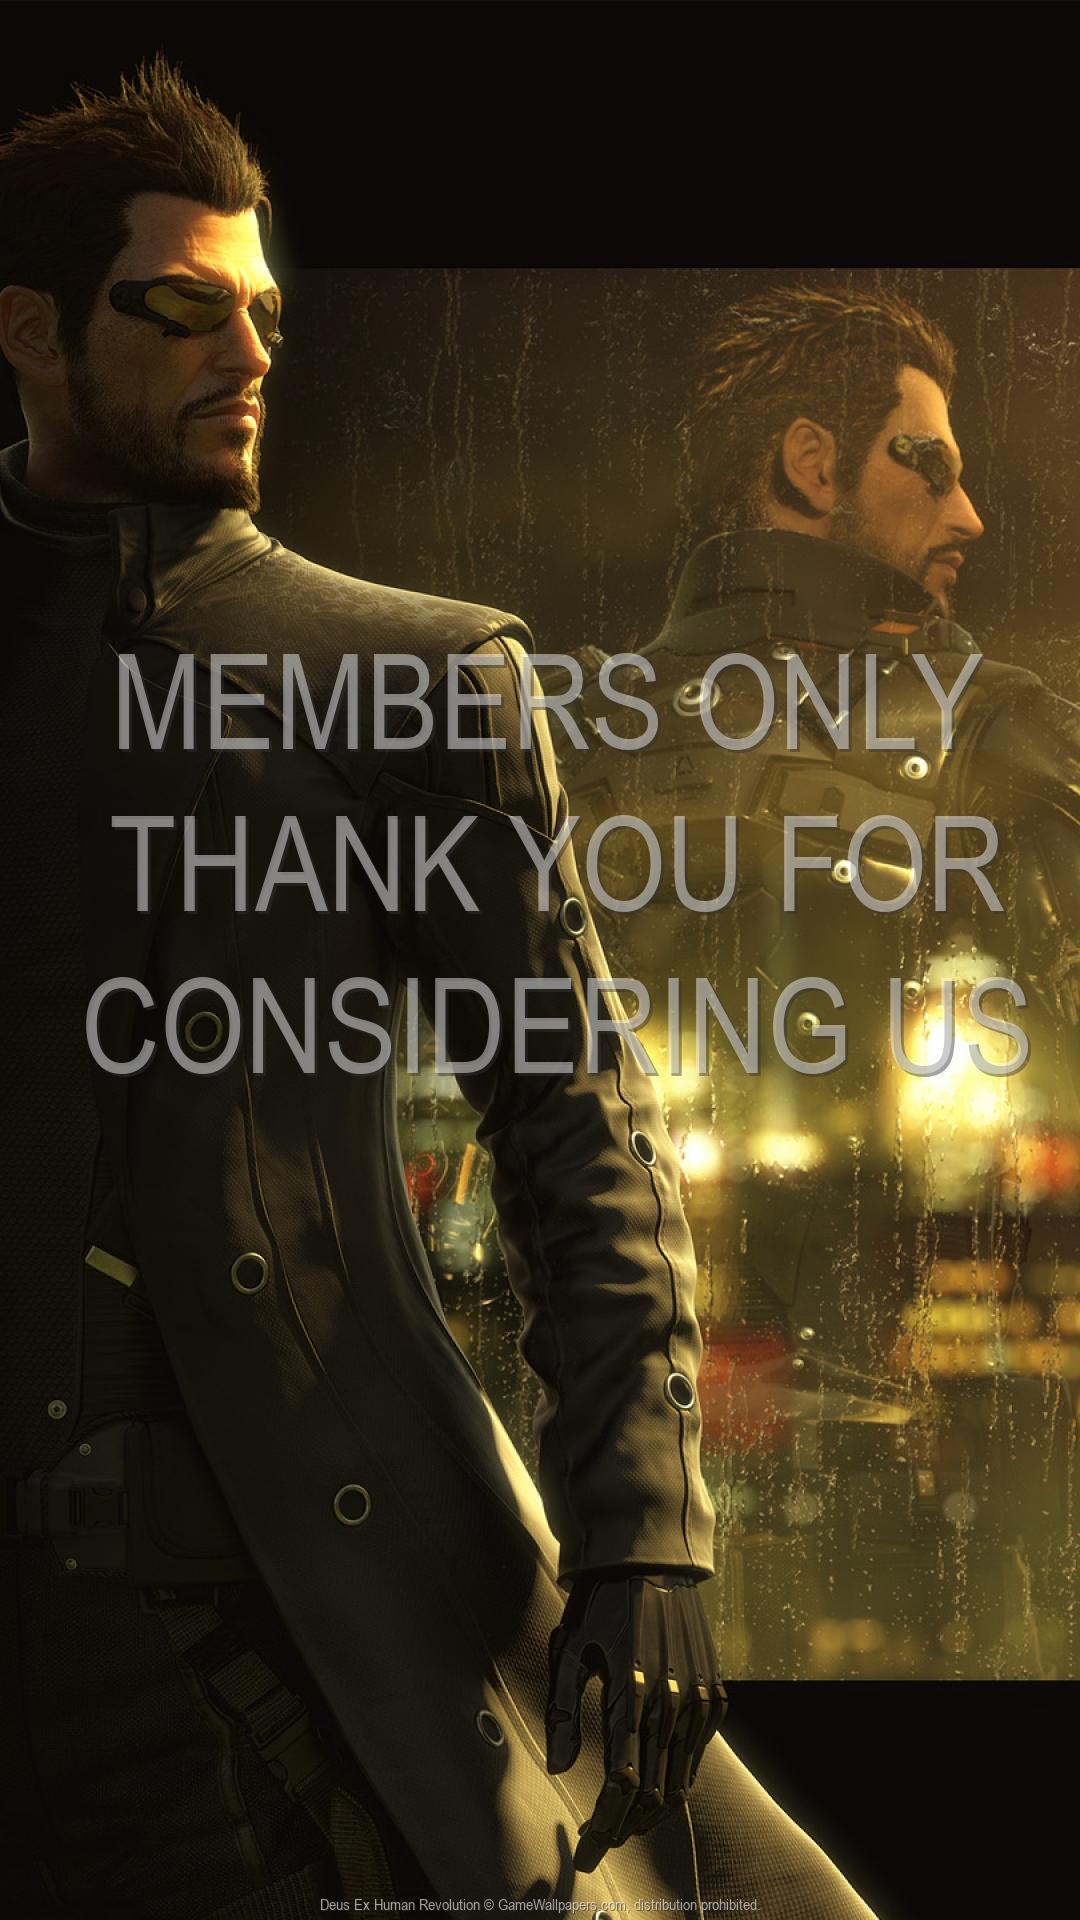 Deus Ex: Human Revolution 1920x1080 Handy Hintergrundbild 06